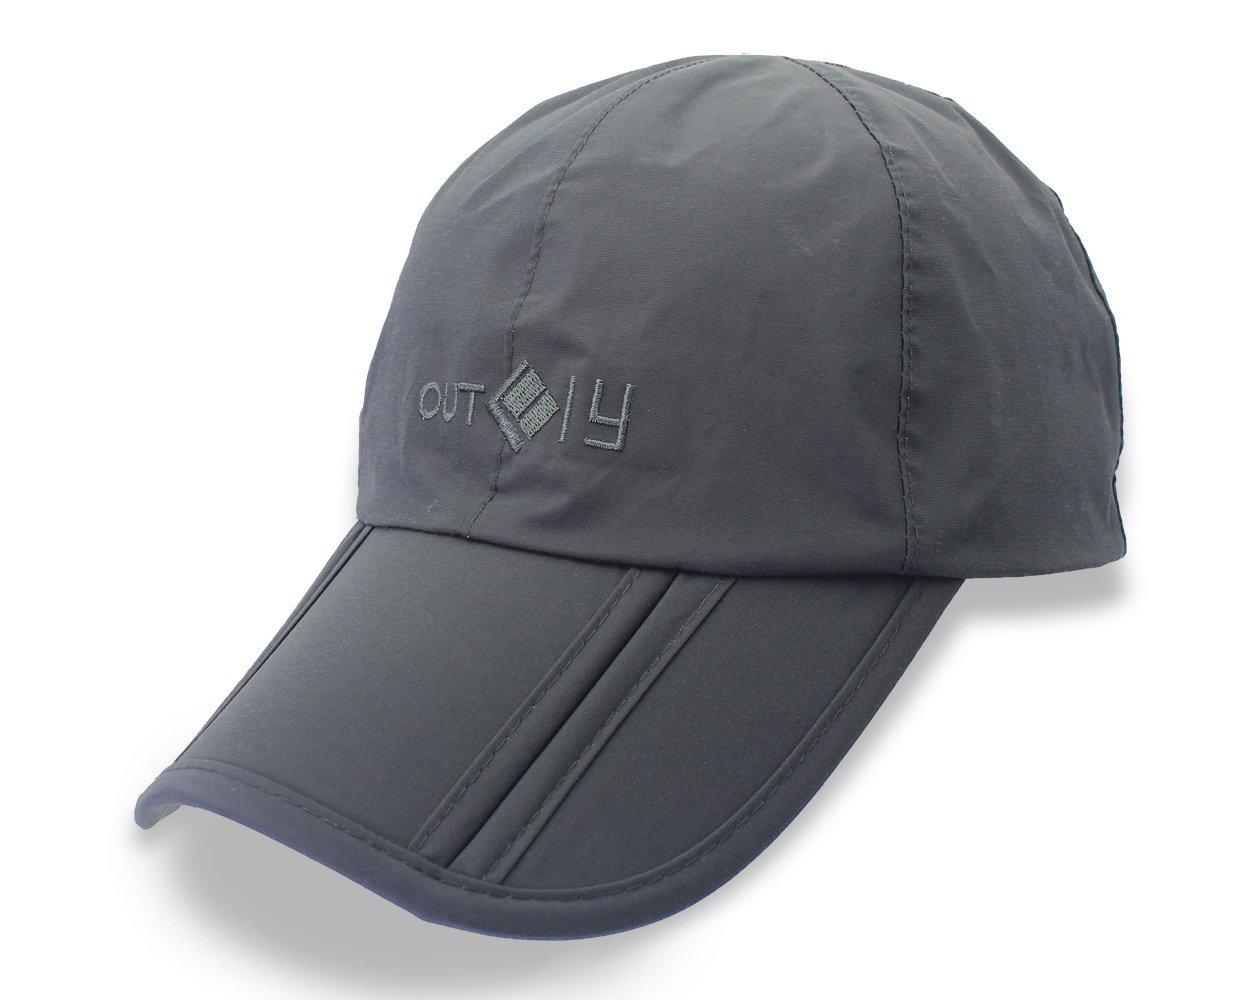 Ace Select UV 50+ 速干遮阳帽防水长帽檐可折叠跑步户外运动帽可折叠便携式棒球帽男女均适合